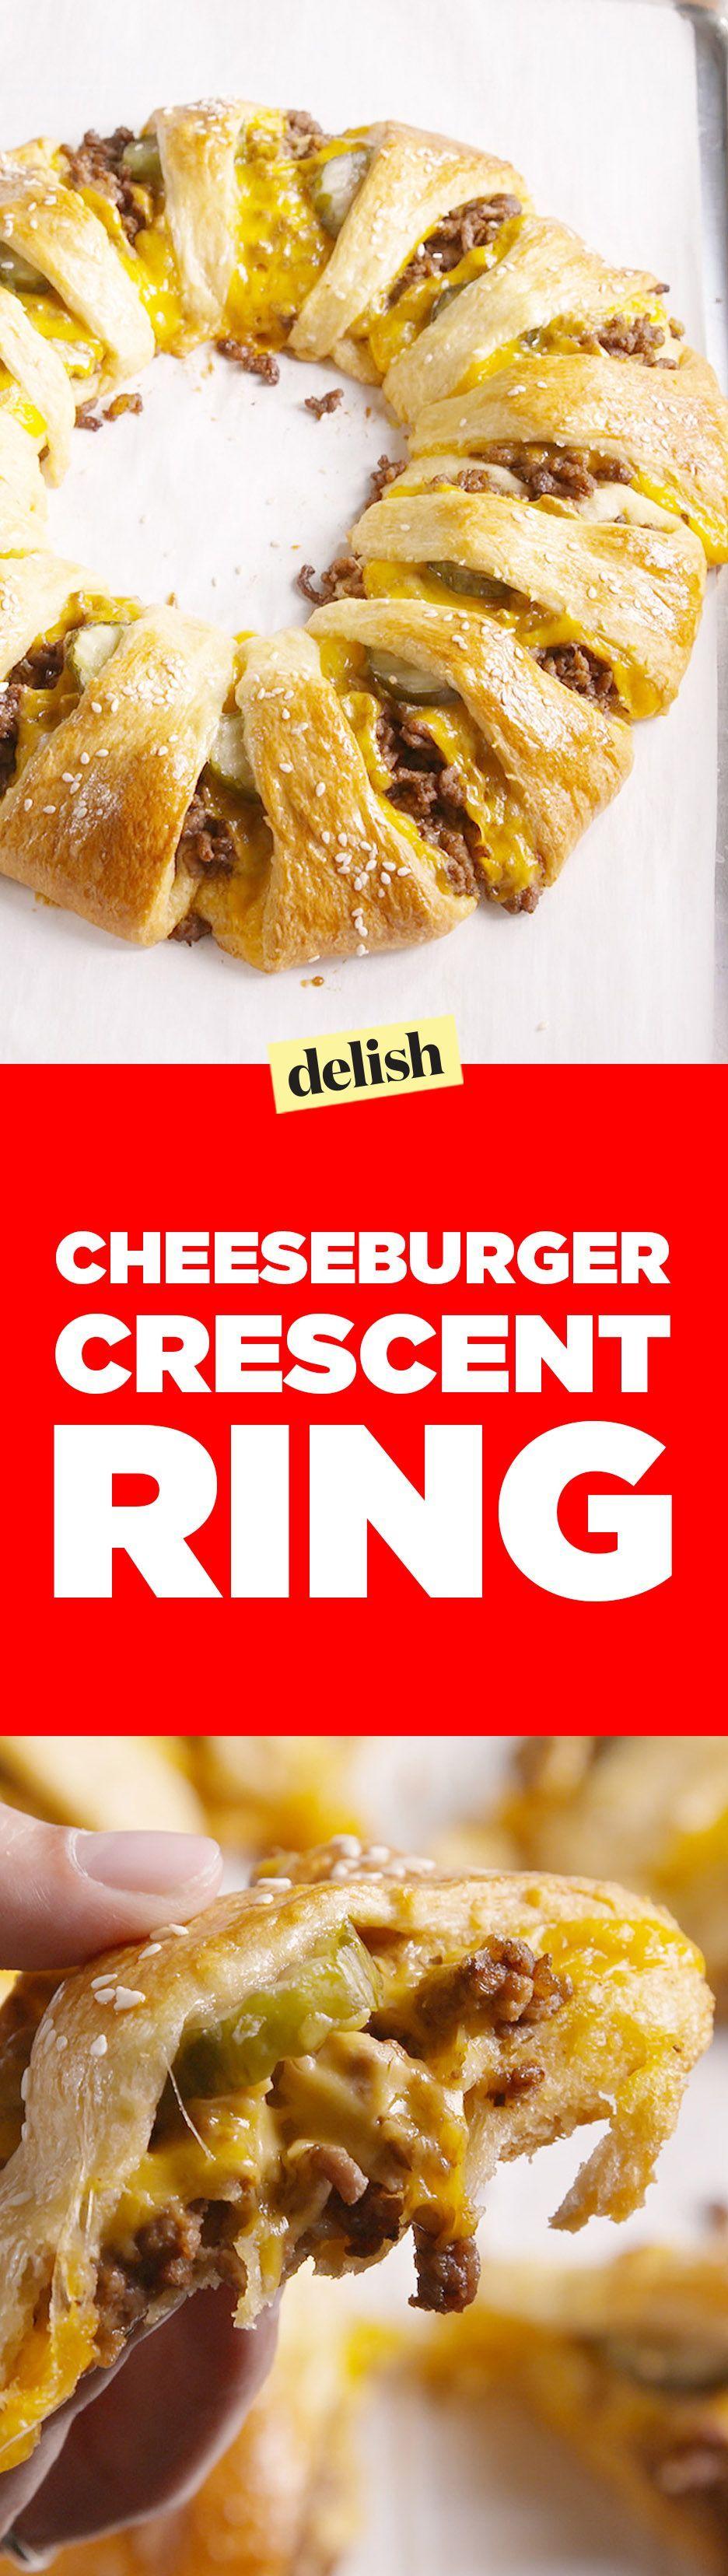 Cheeseburger Crescent Ring